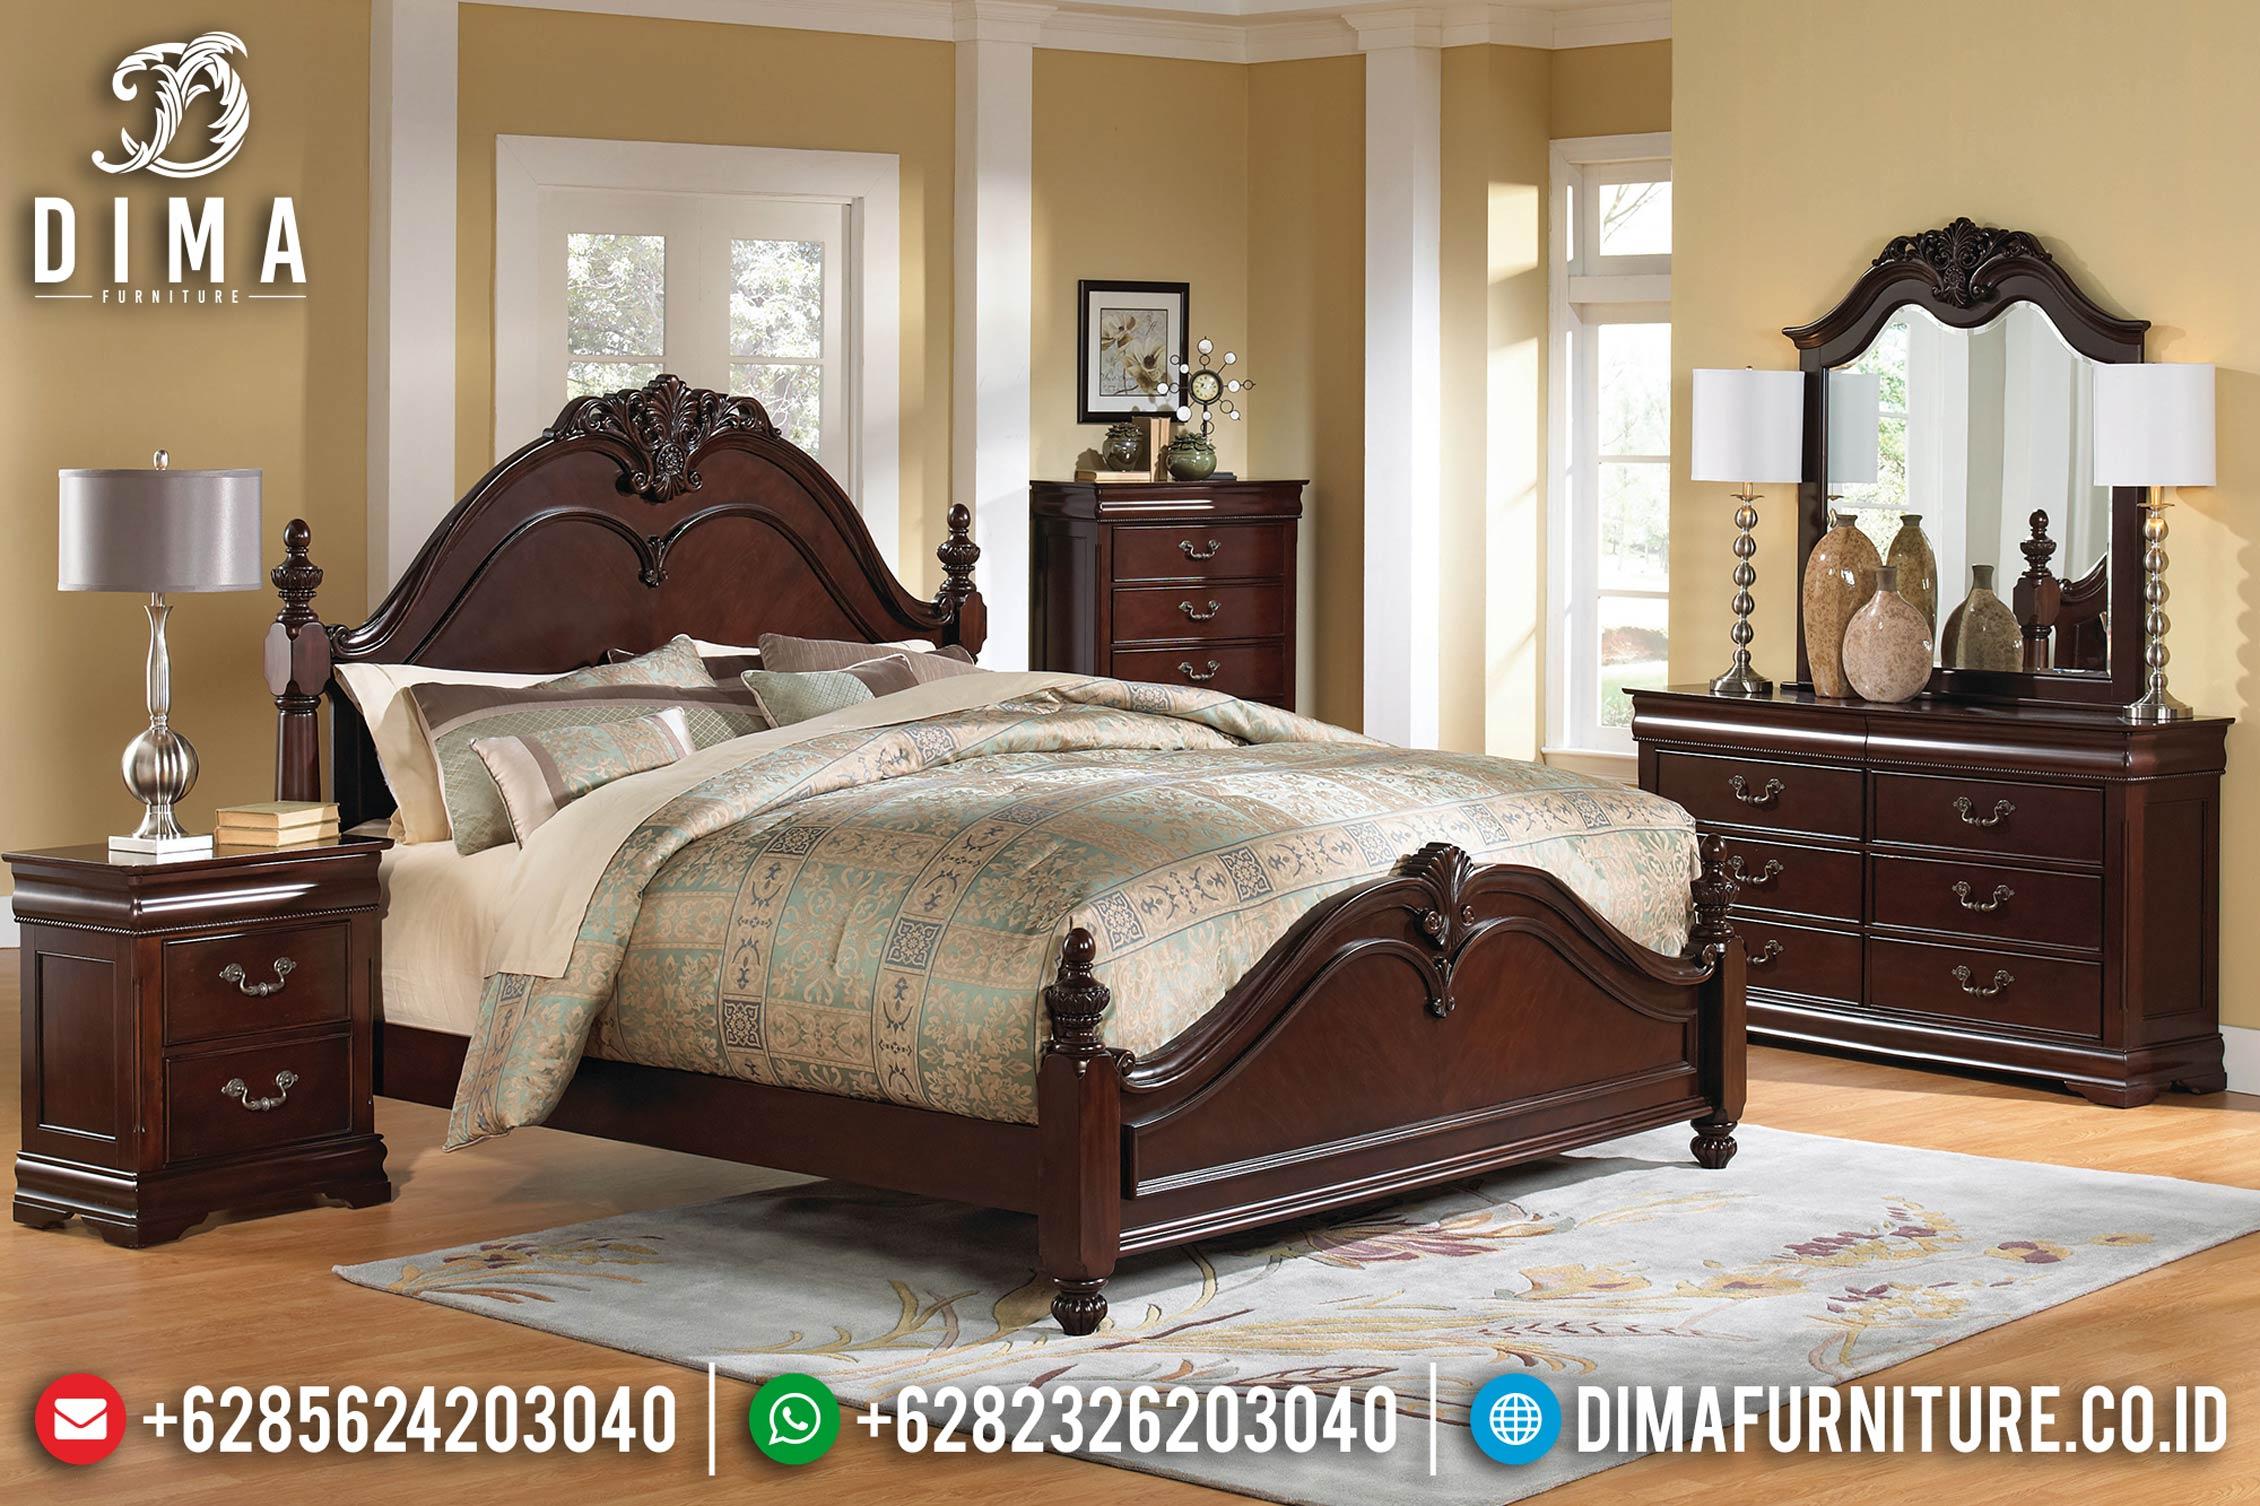 Set Kamar Tidur Minimalis Jati Jepara Mewah Terbaru Luxury ST-0422